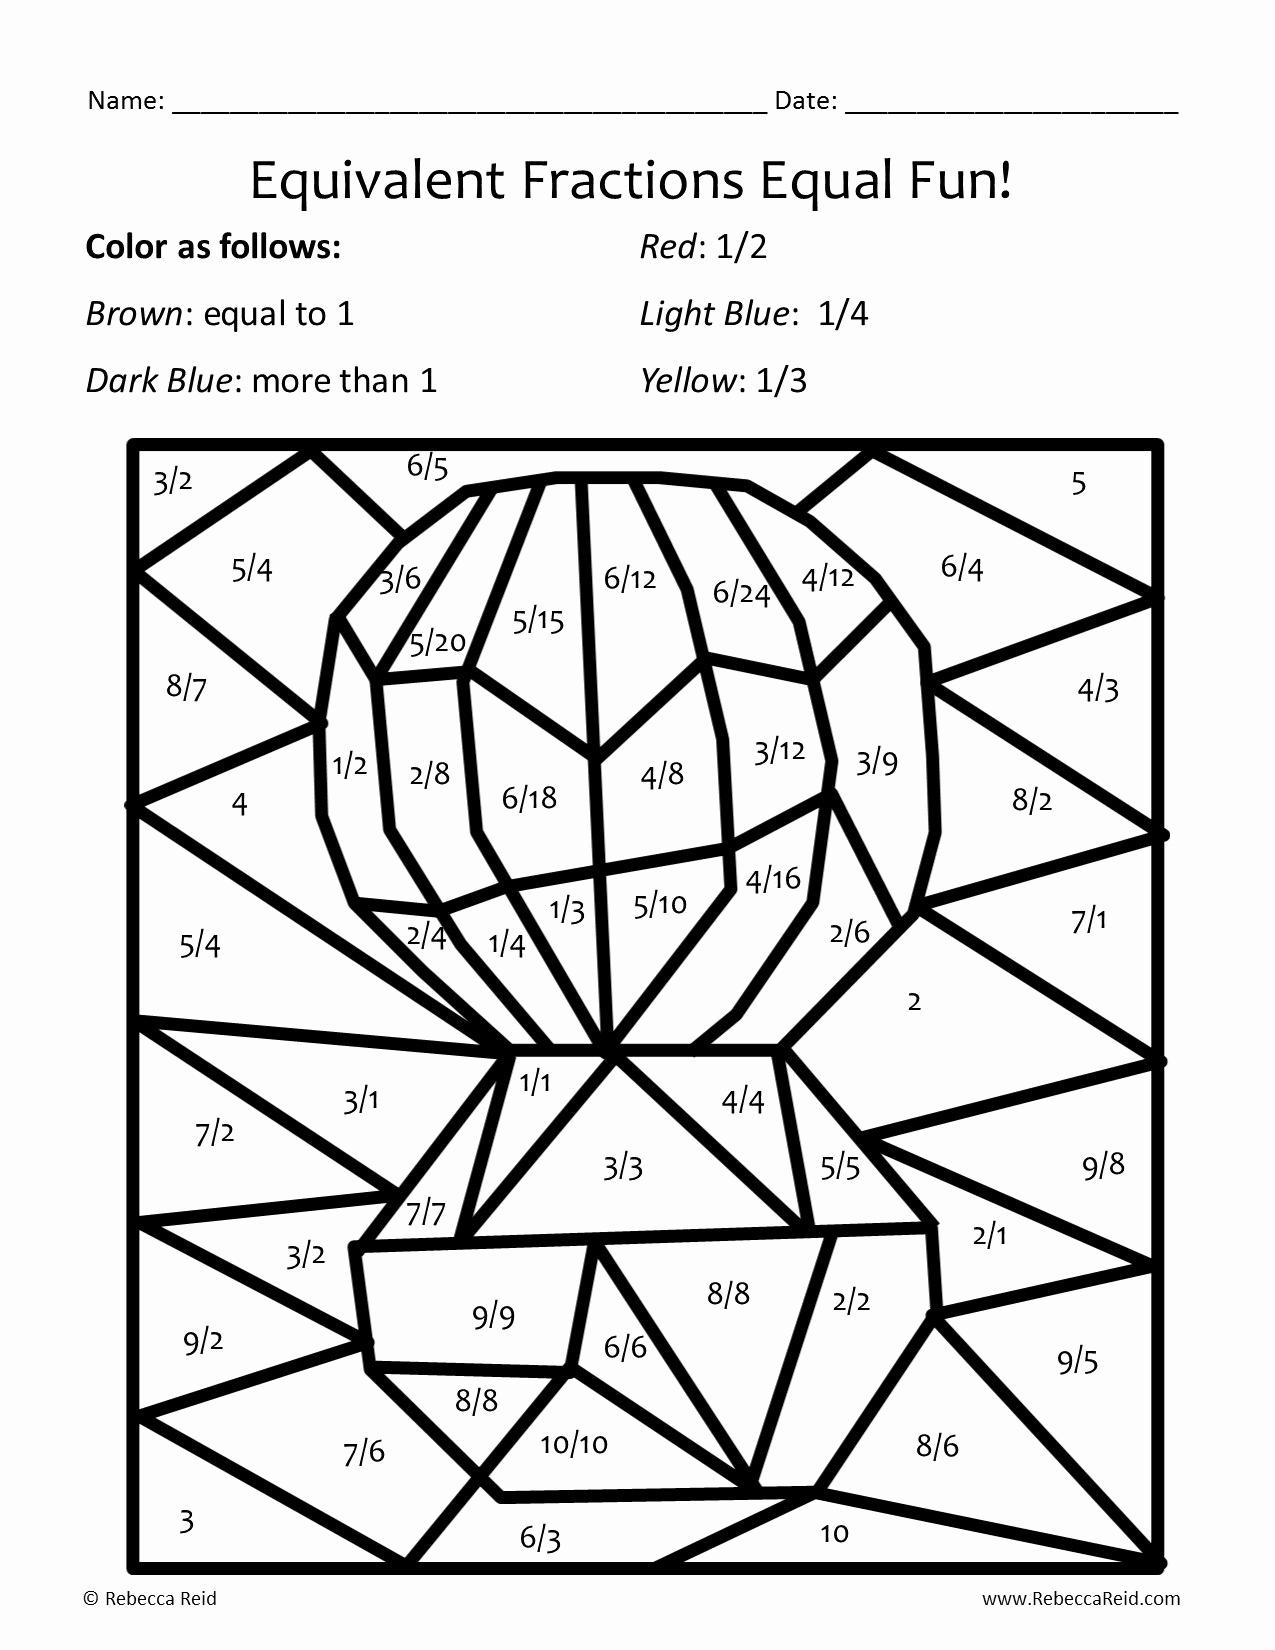 Equivalent Fractions Coloring Worksheet Lovely Fraction Coloring Sheets Coloring Pages